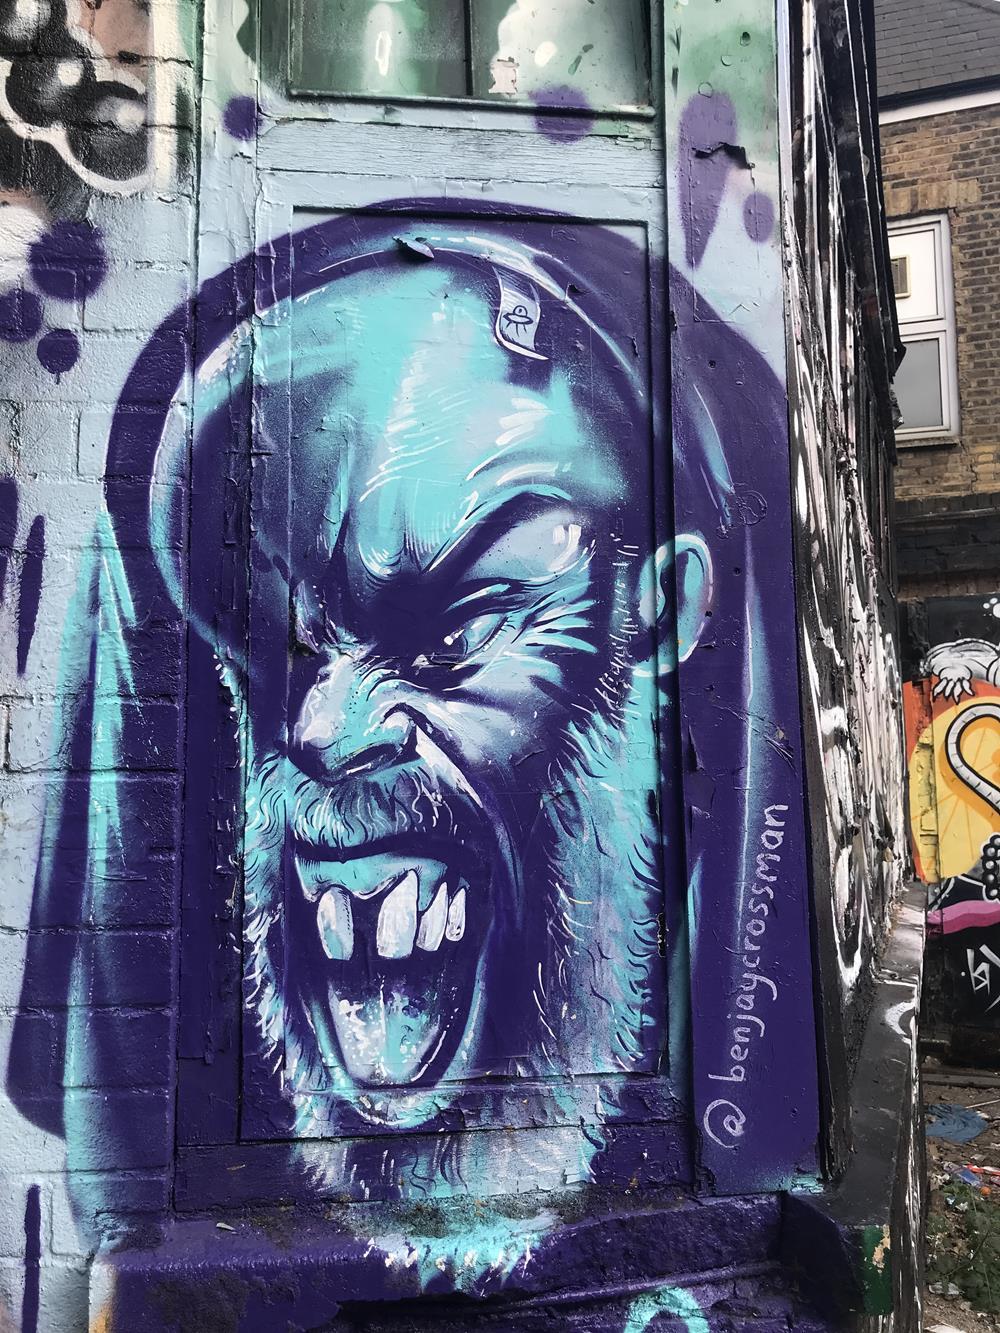 Wall mural by Benjaycrossman in Brick Lane